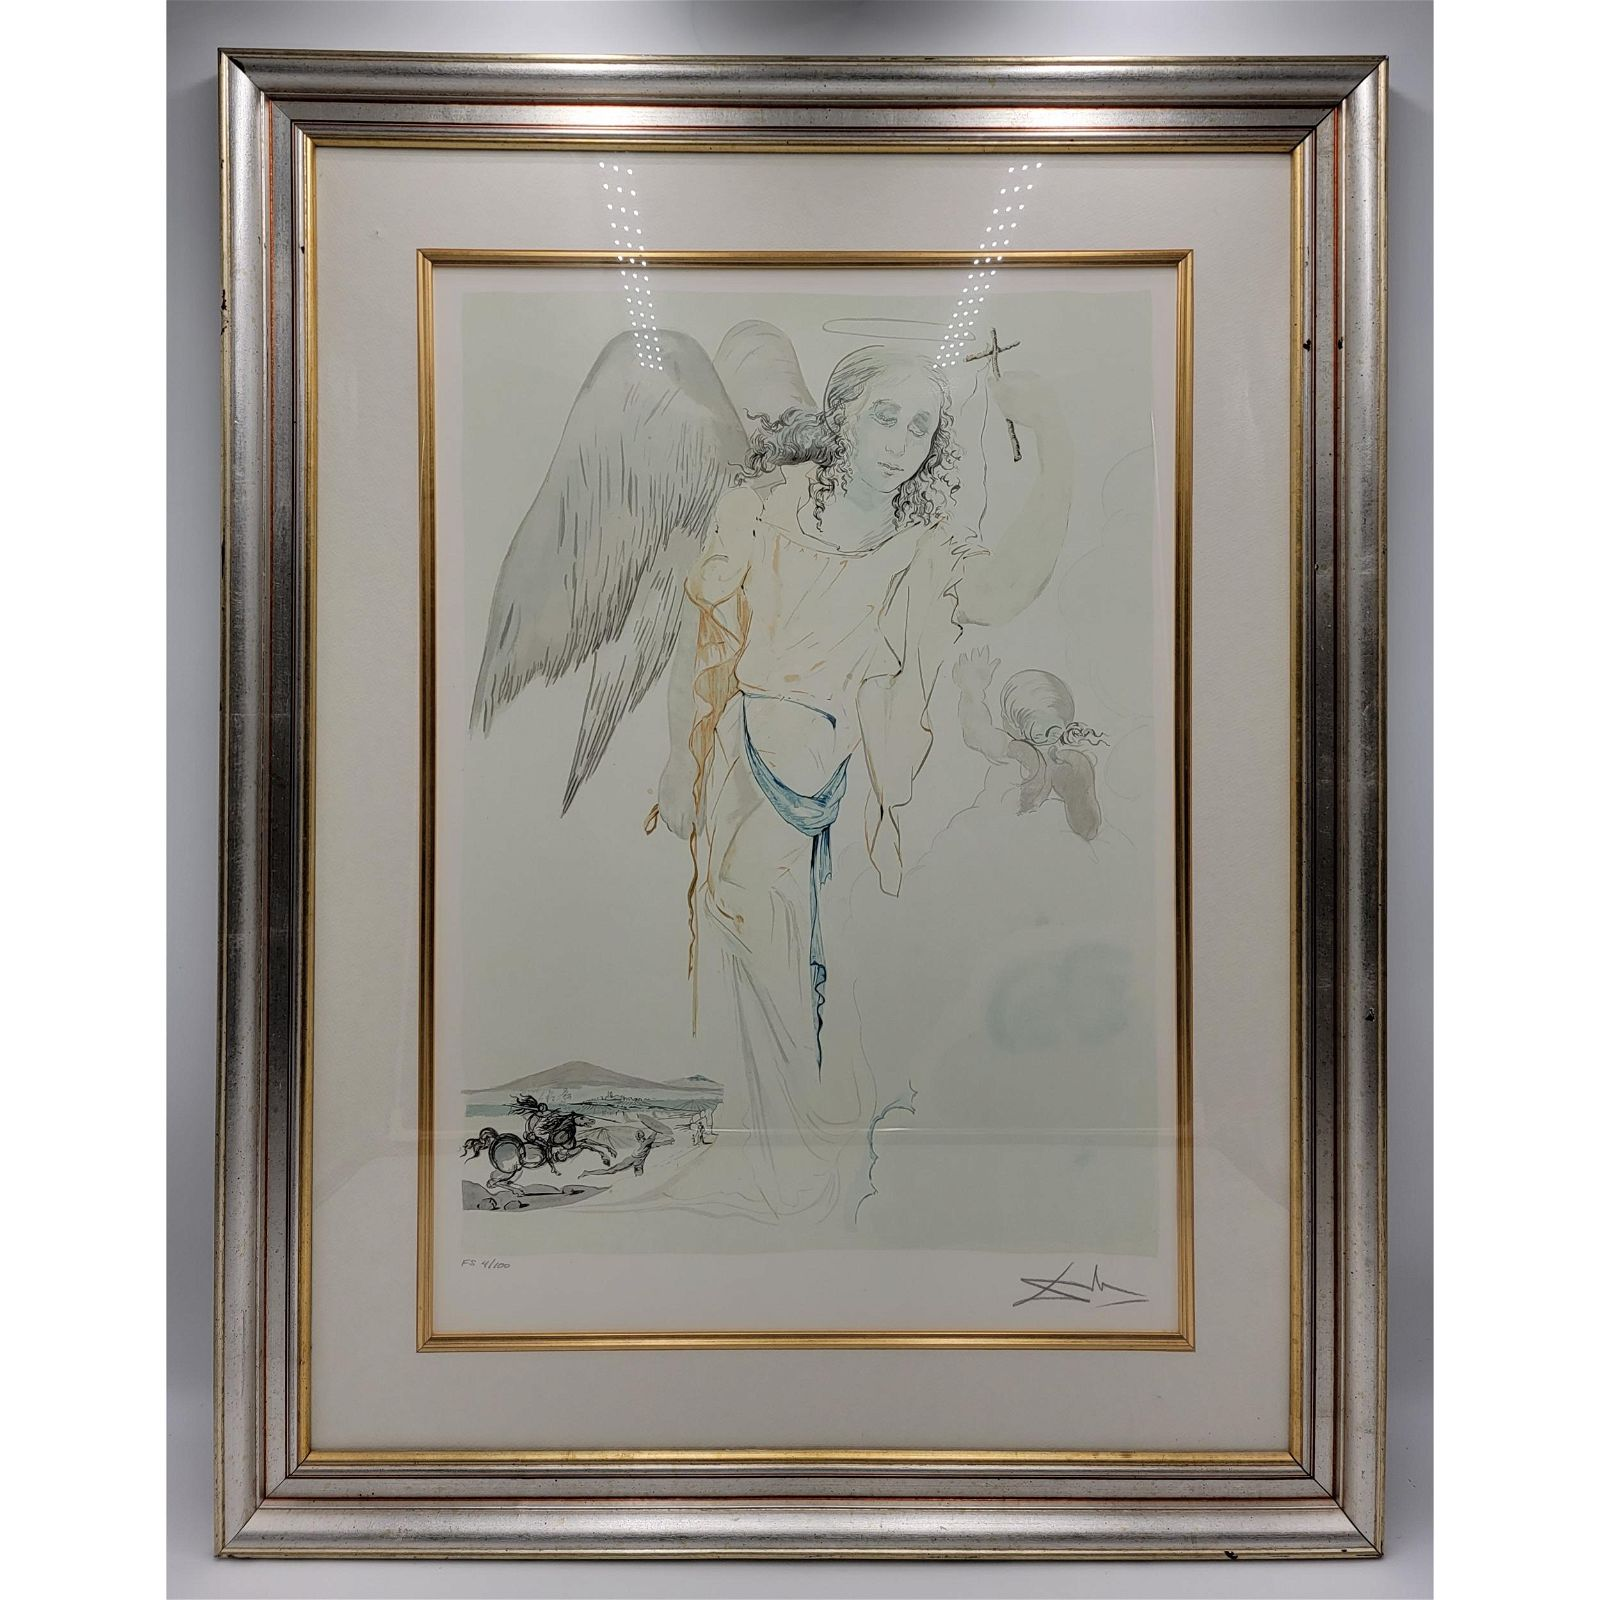 Salvador Dali 1904-89 Lithograph Signed